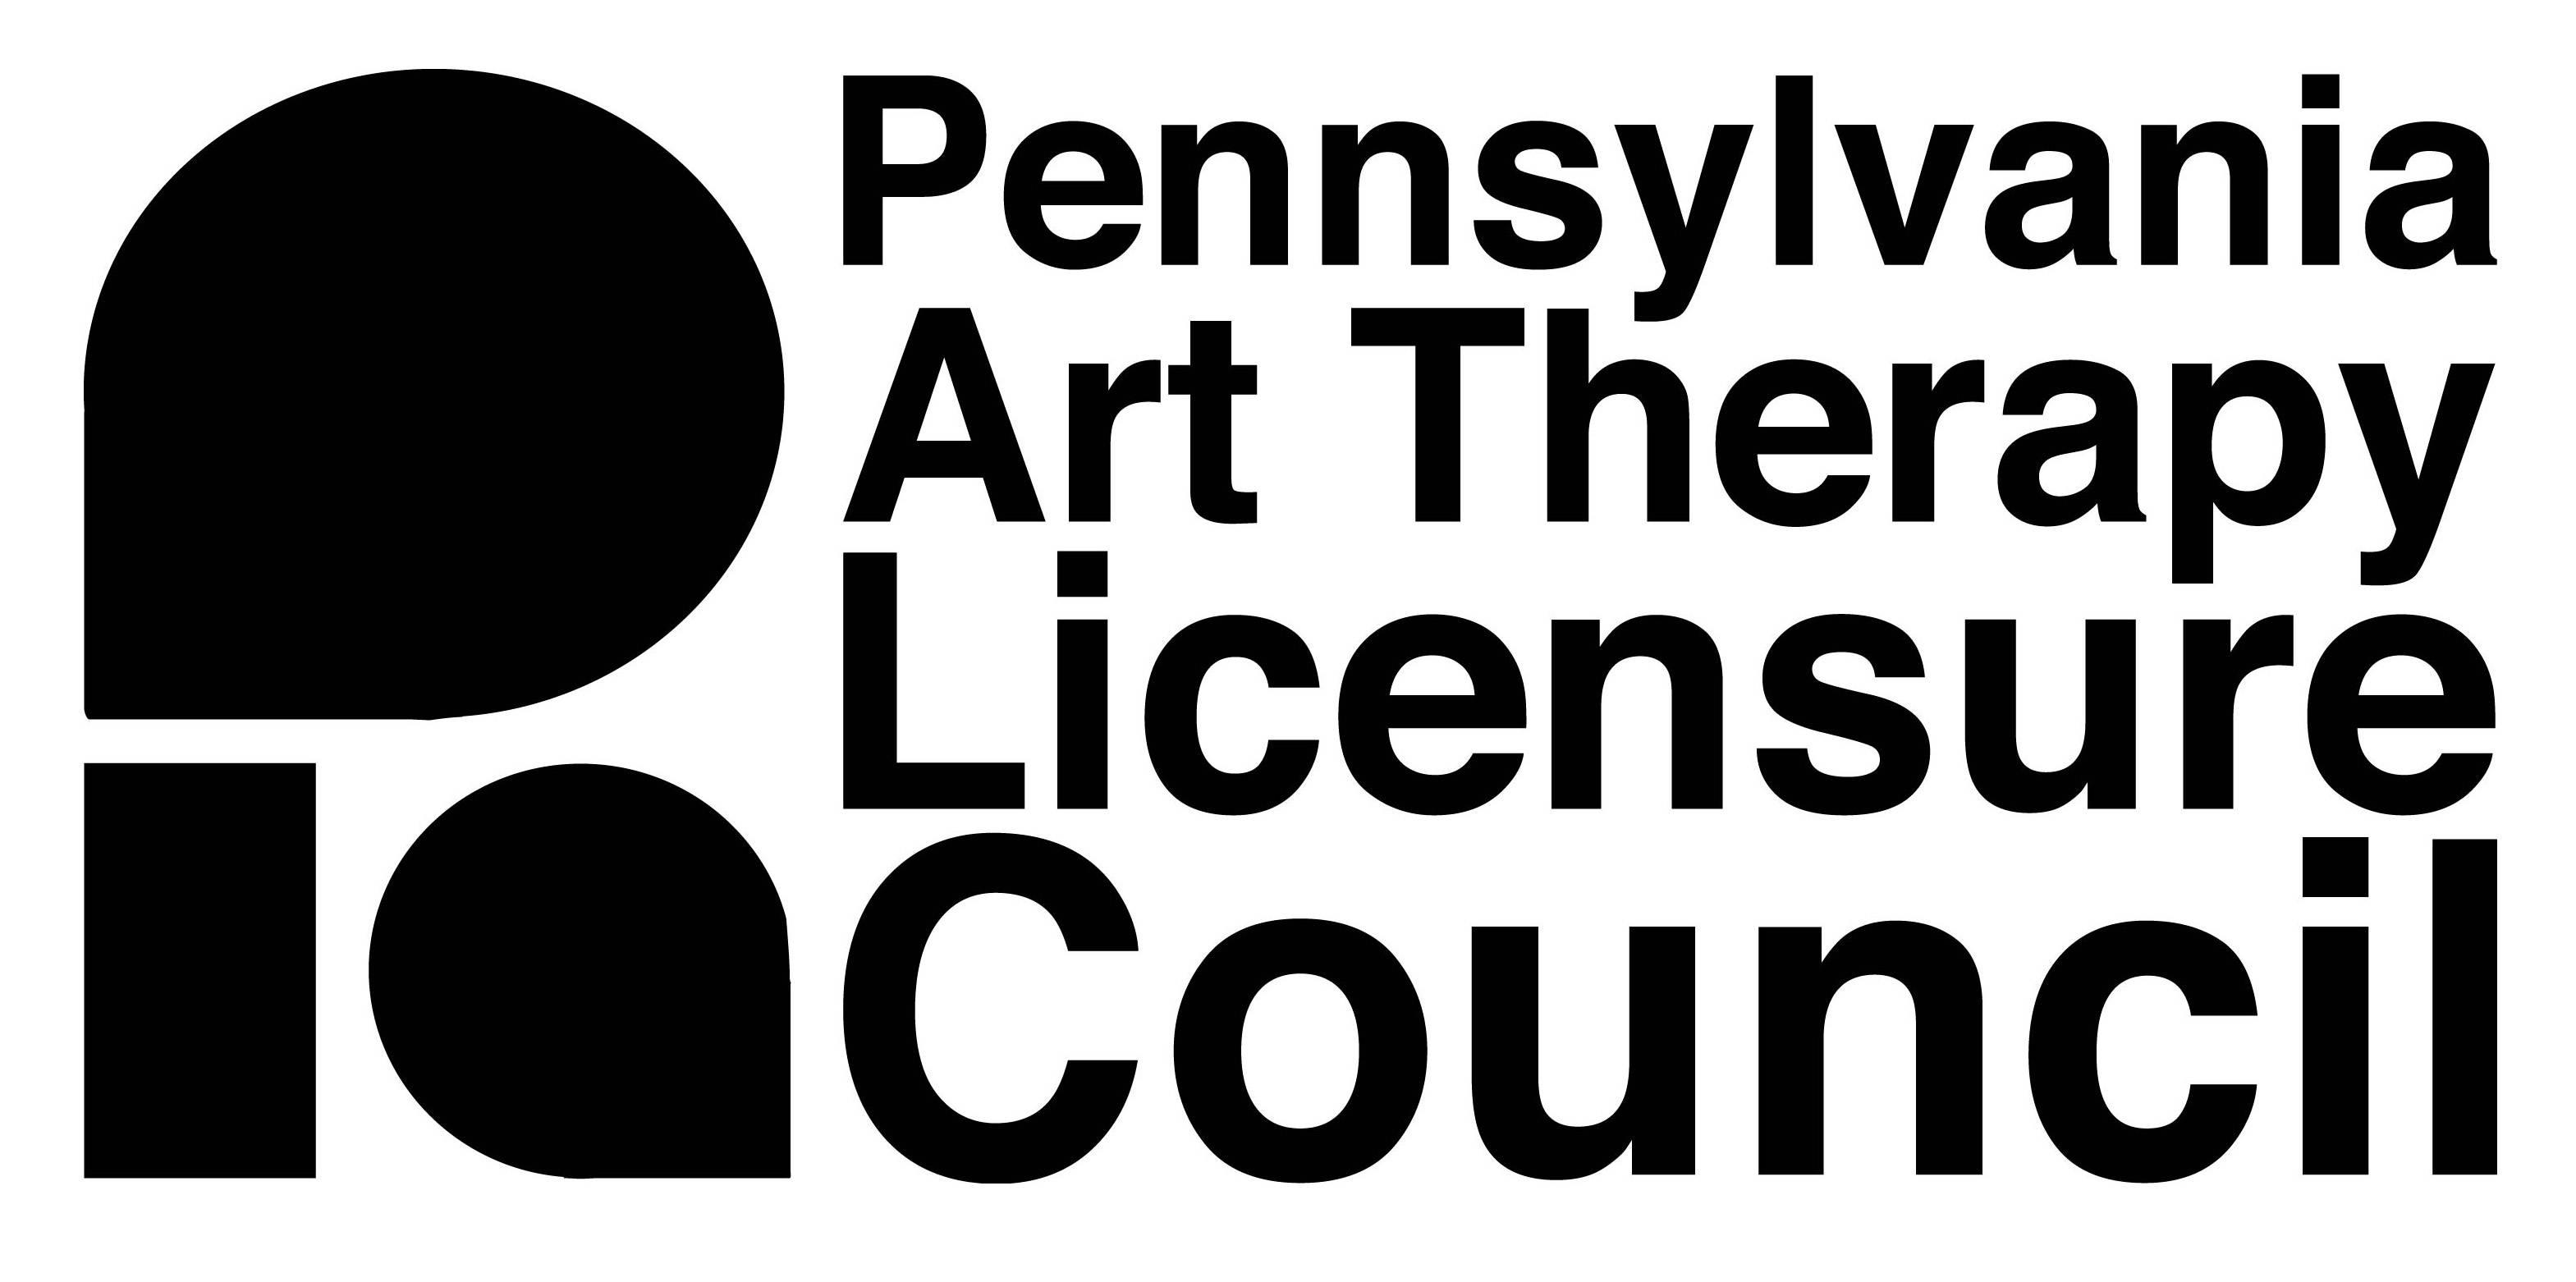 Pennsylvania Art Therapy Licensure Council Logo